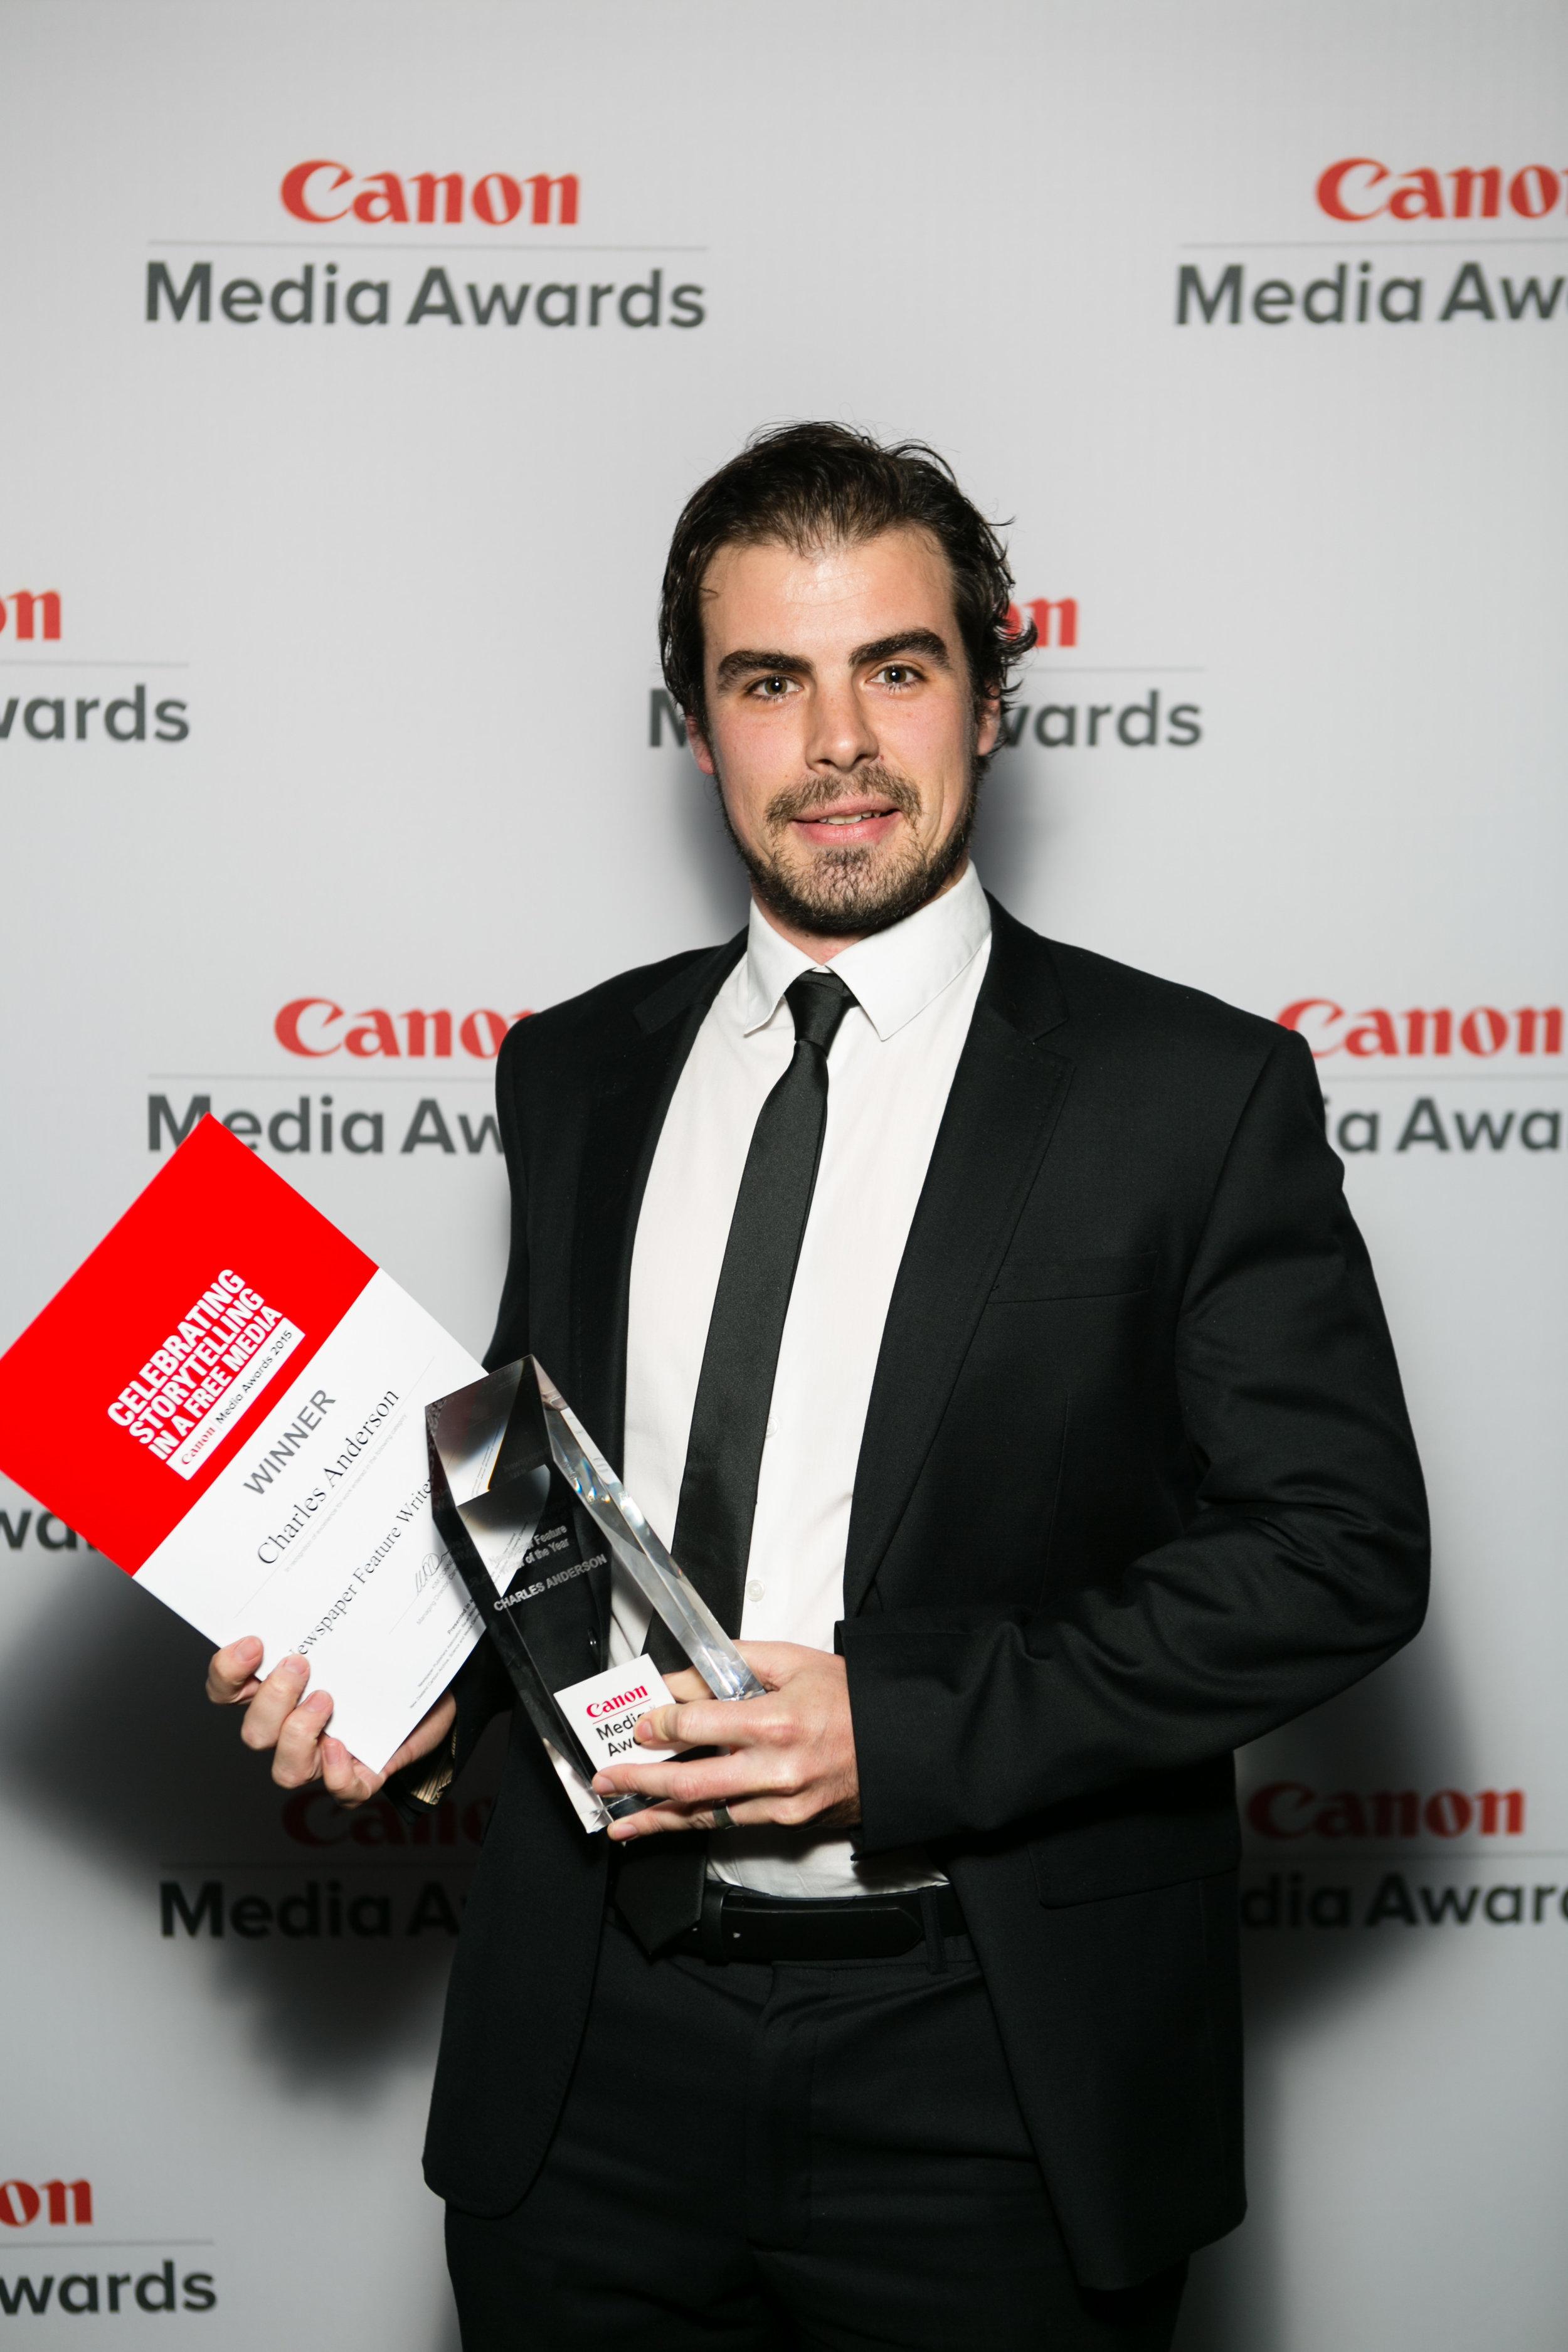 canon_media_awards_2015_interlike_nz_clinton_tudor-5912-182.jpg